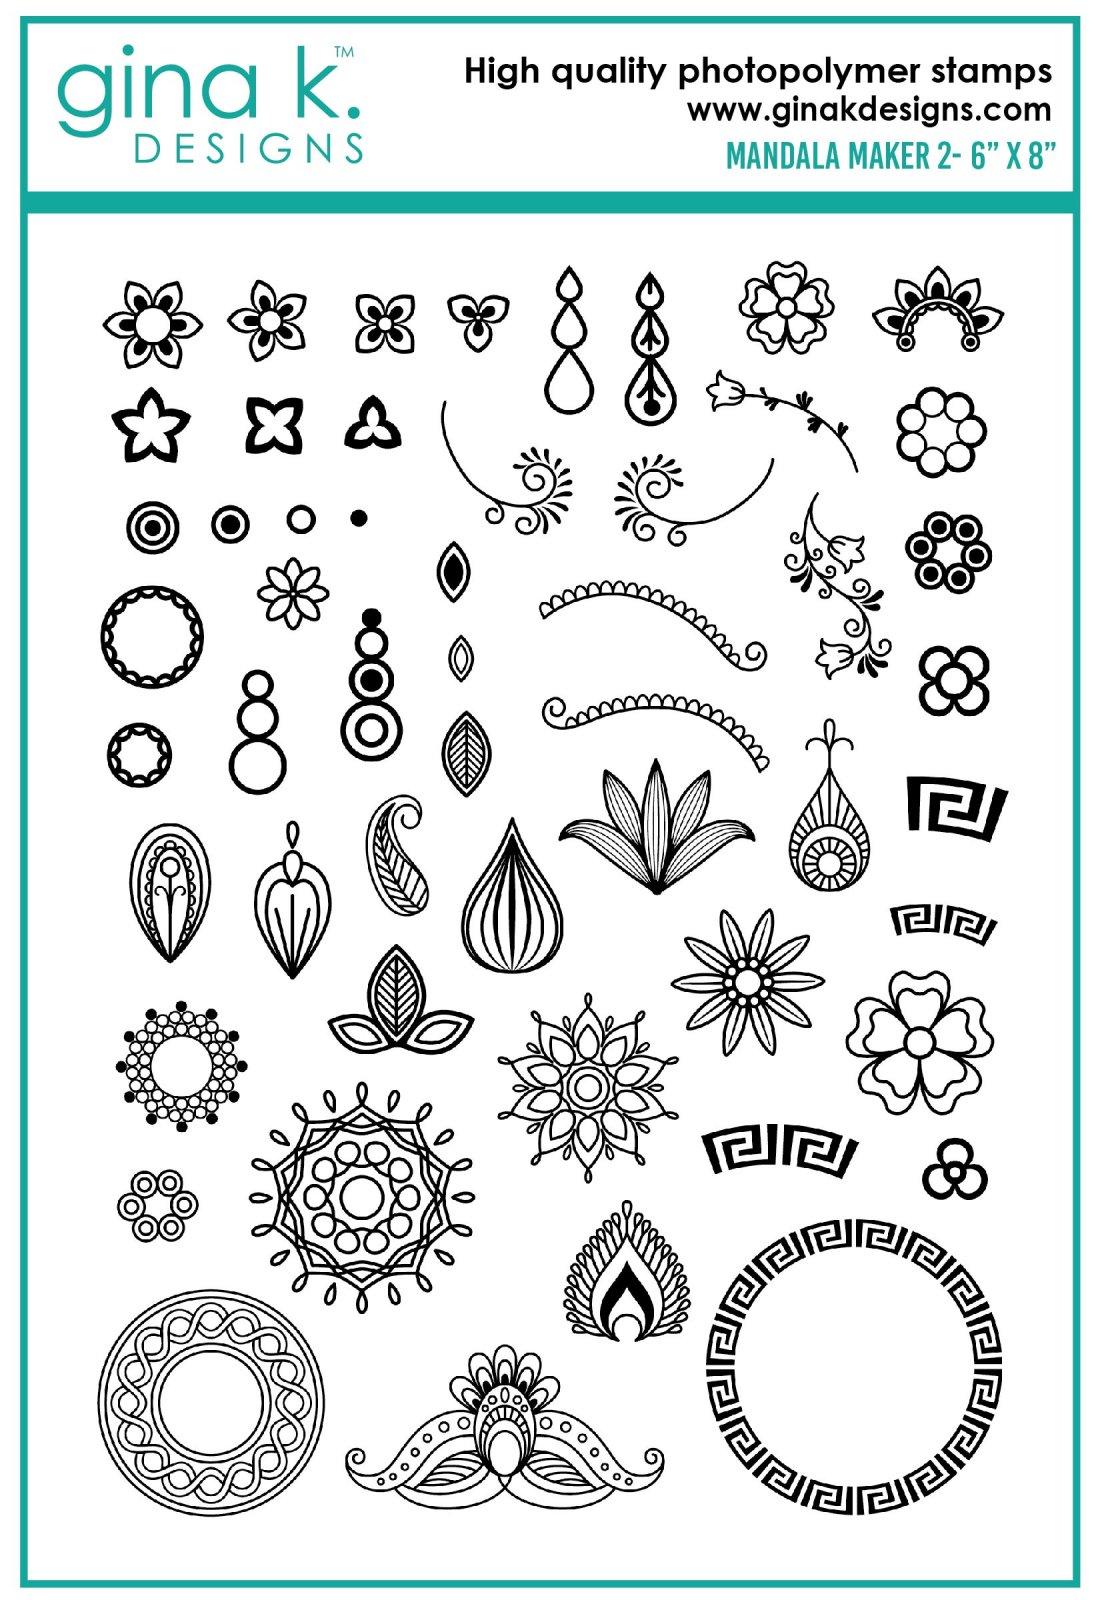 Gina K Designs Mandala Maker 2